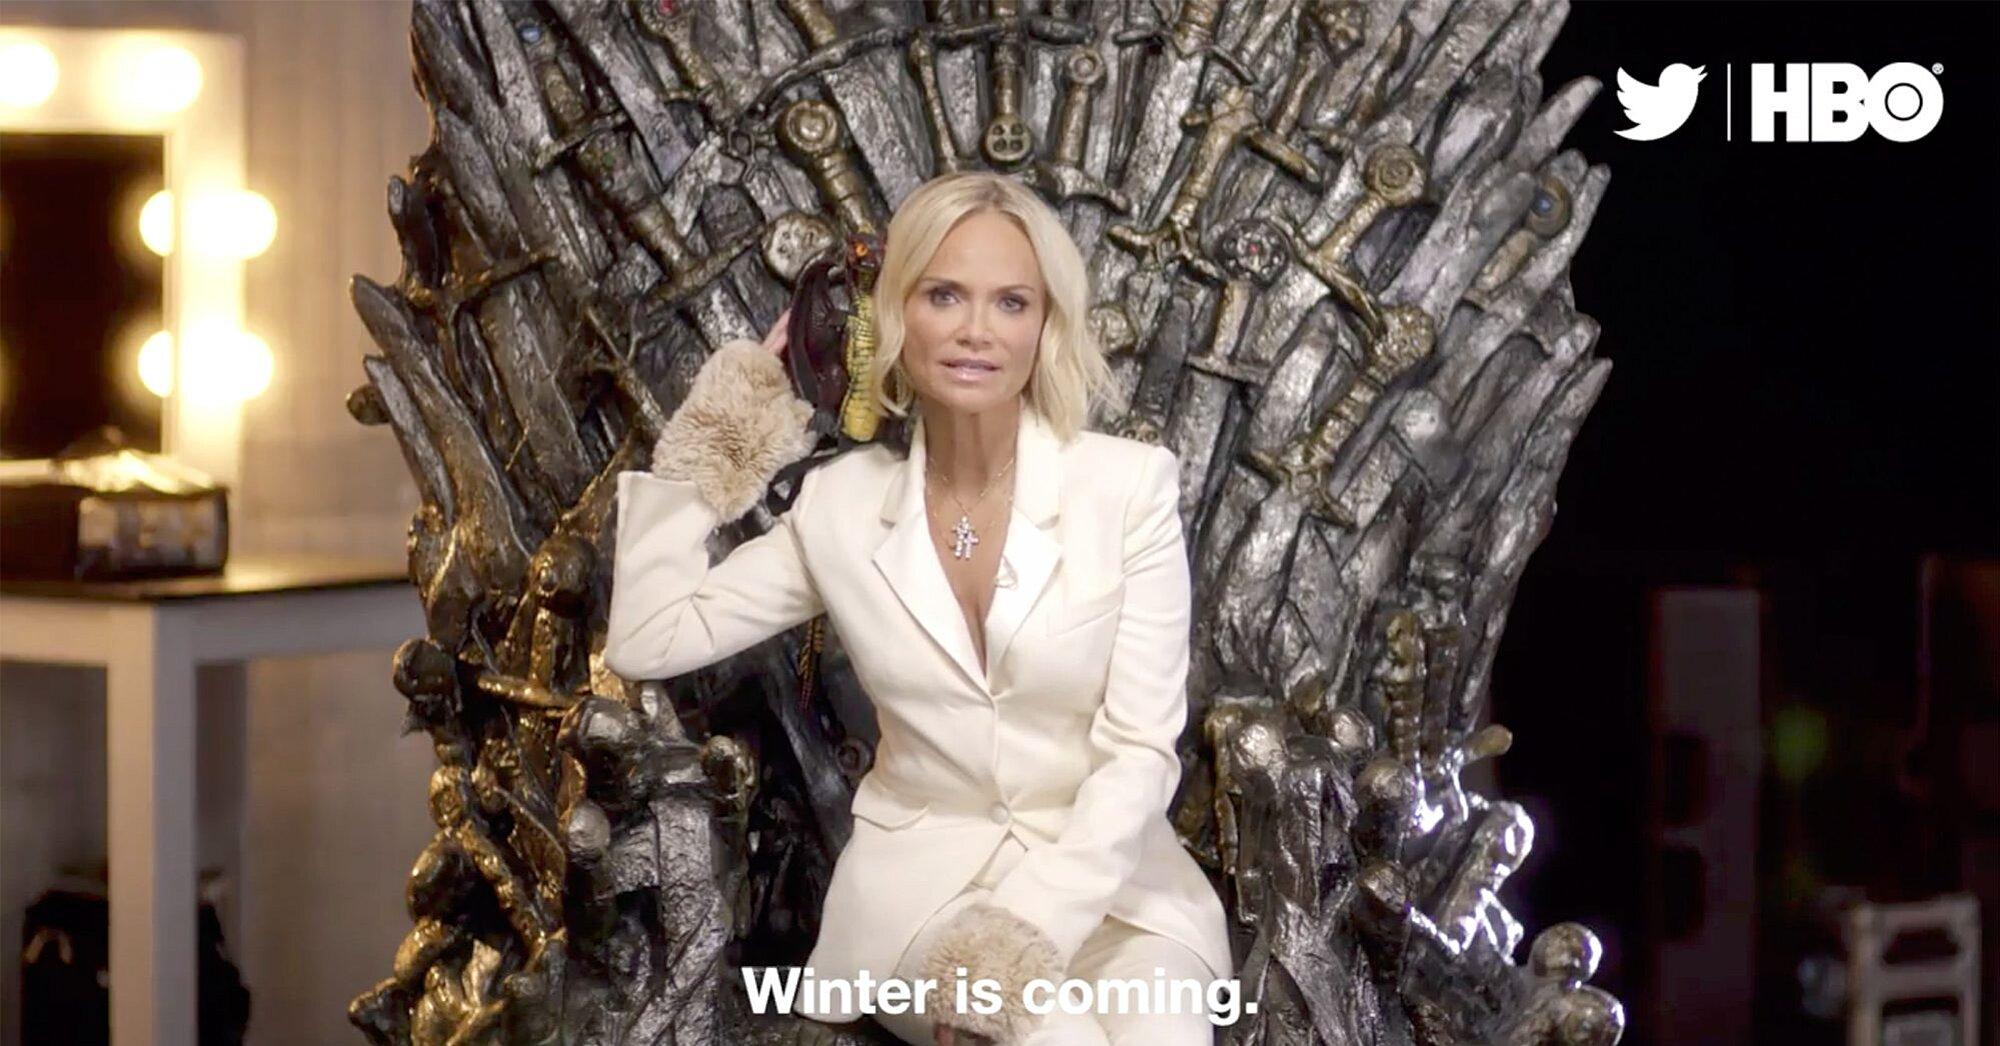 Game Of Thrones Final Season Jimmy Kimmel Kristin Chenoweth Star In Promo Ew Com